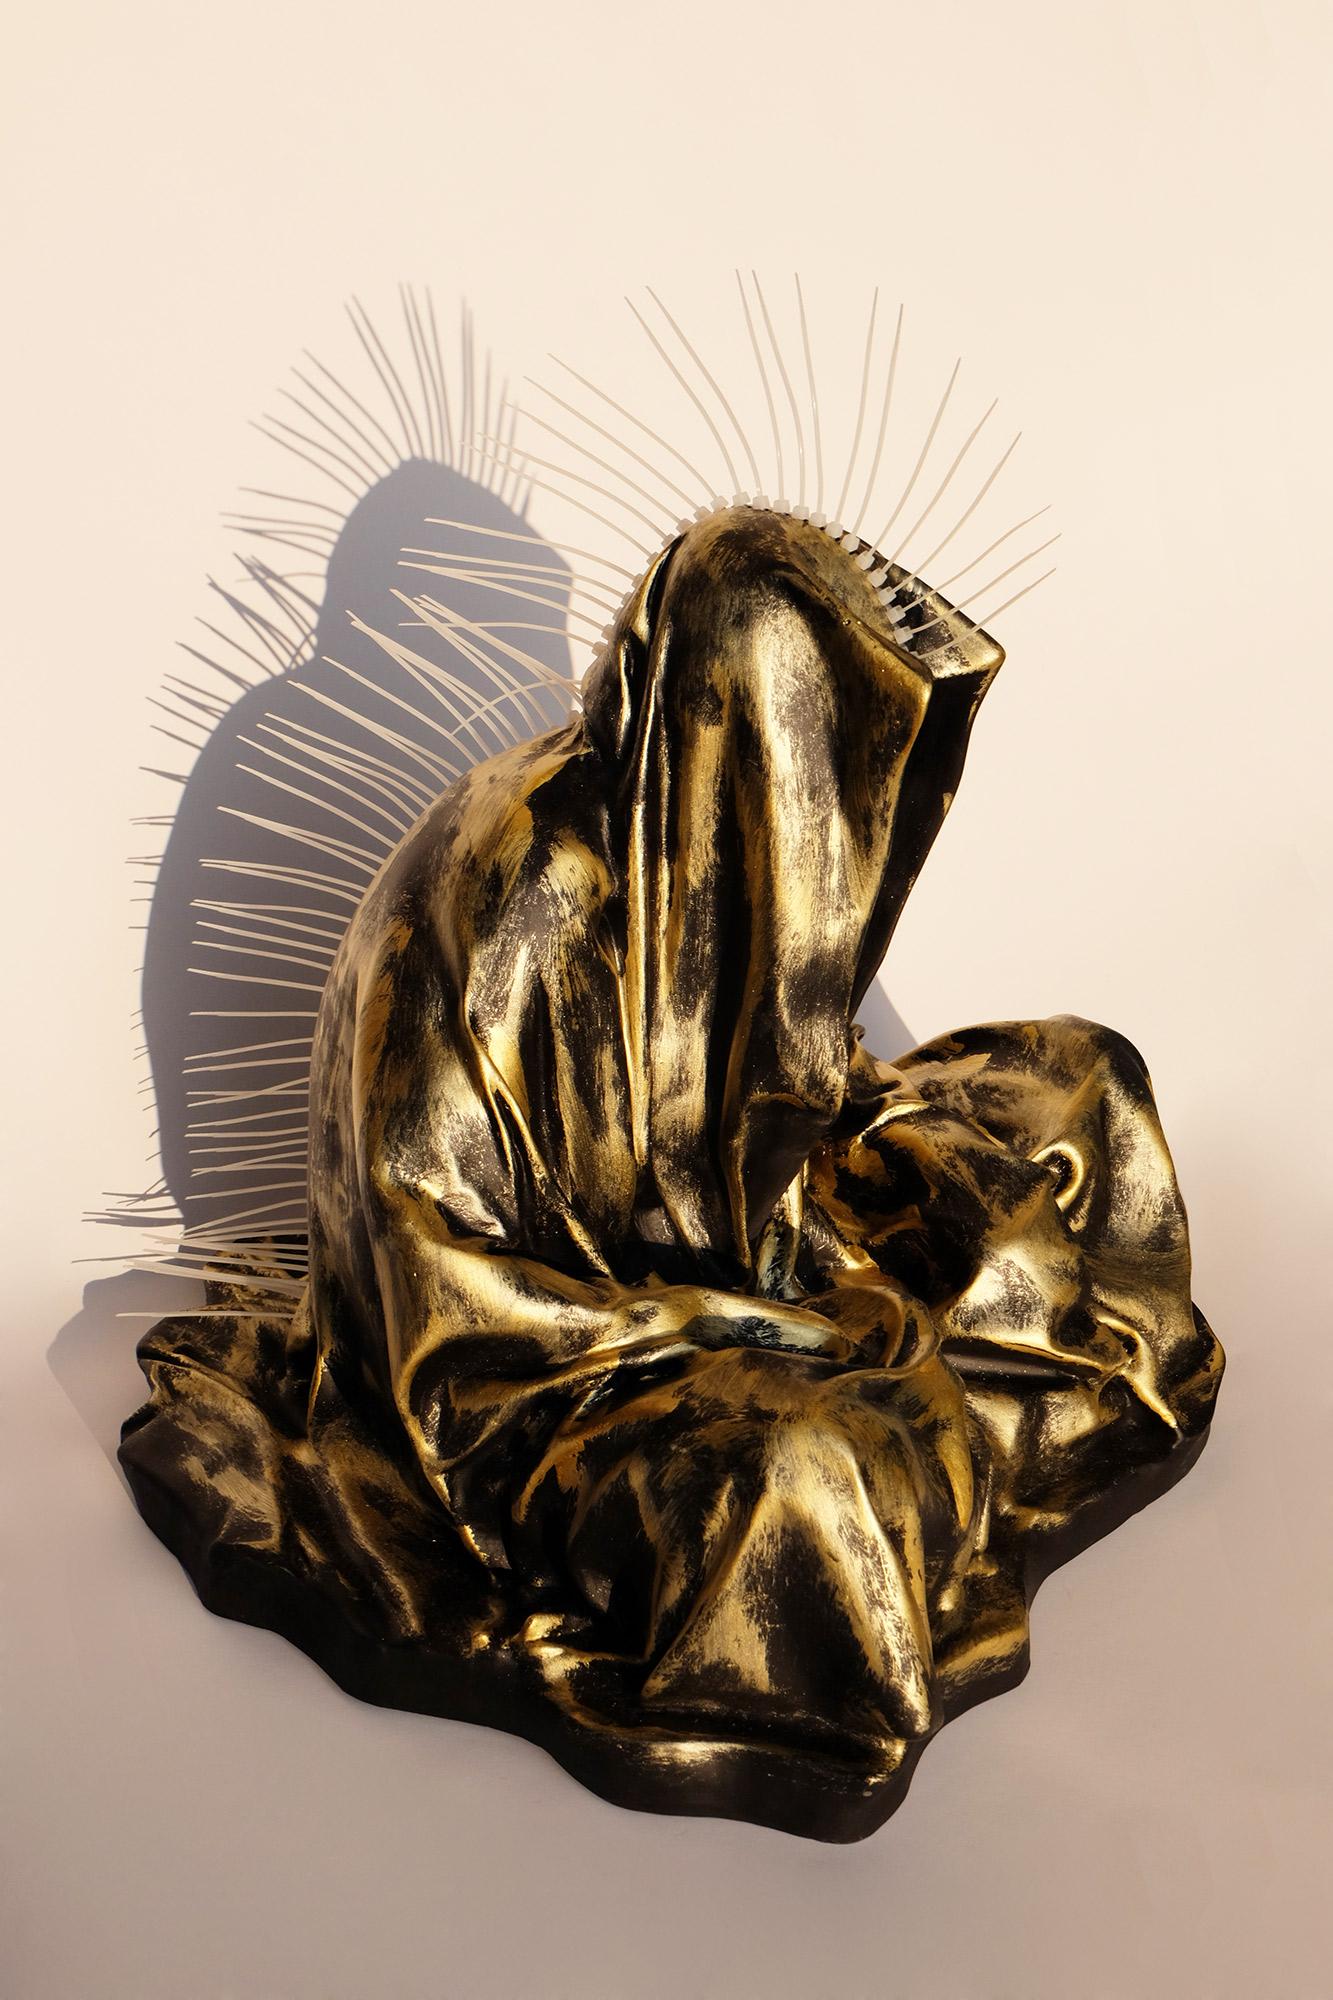 guardians-of-time-manfred-kili-kielnhofer-contemporary-art-fine-arts-modern-design-famouse-statue-sculpture-plastic-gallery-cable ties zip ty museum-shop-store-faceless-irokese-7848